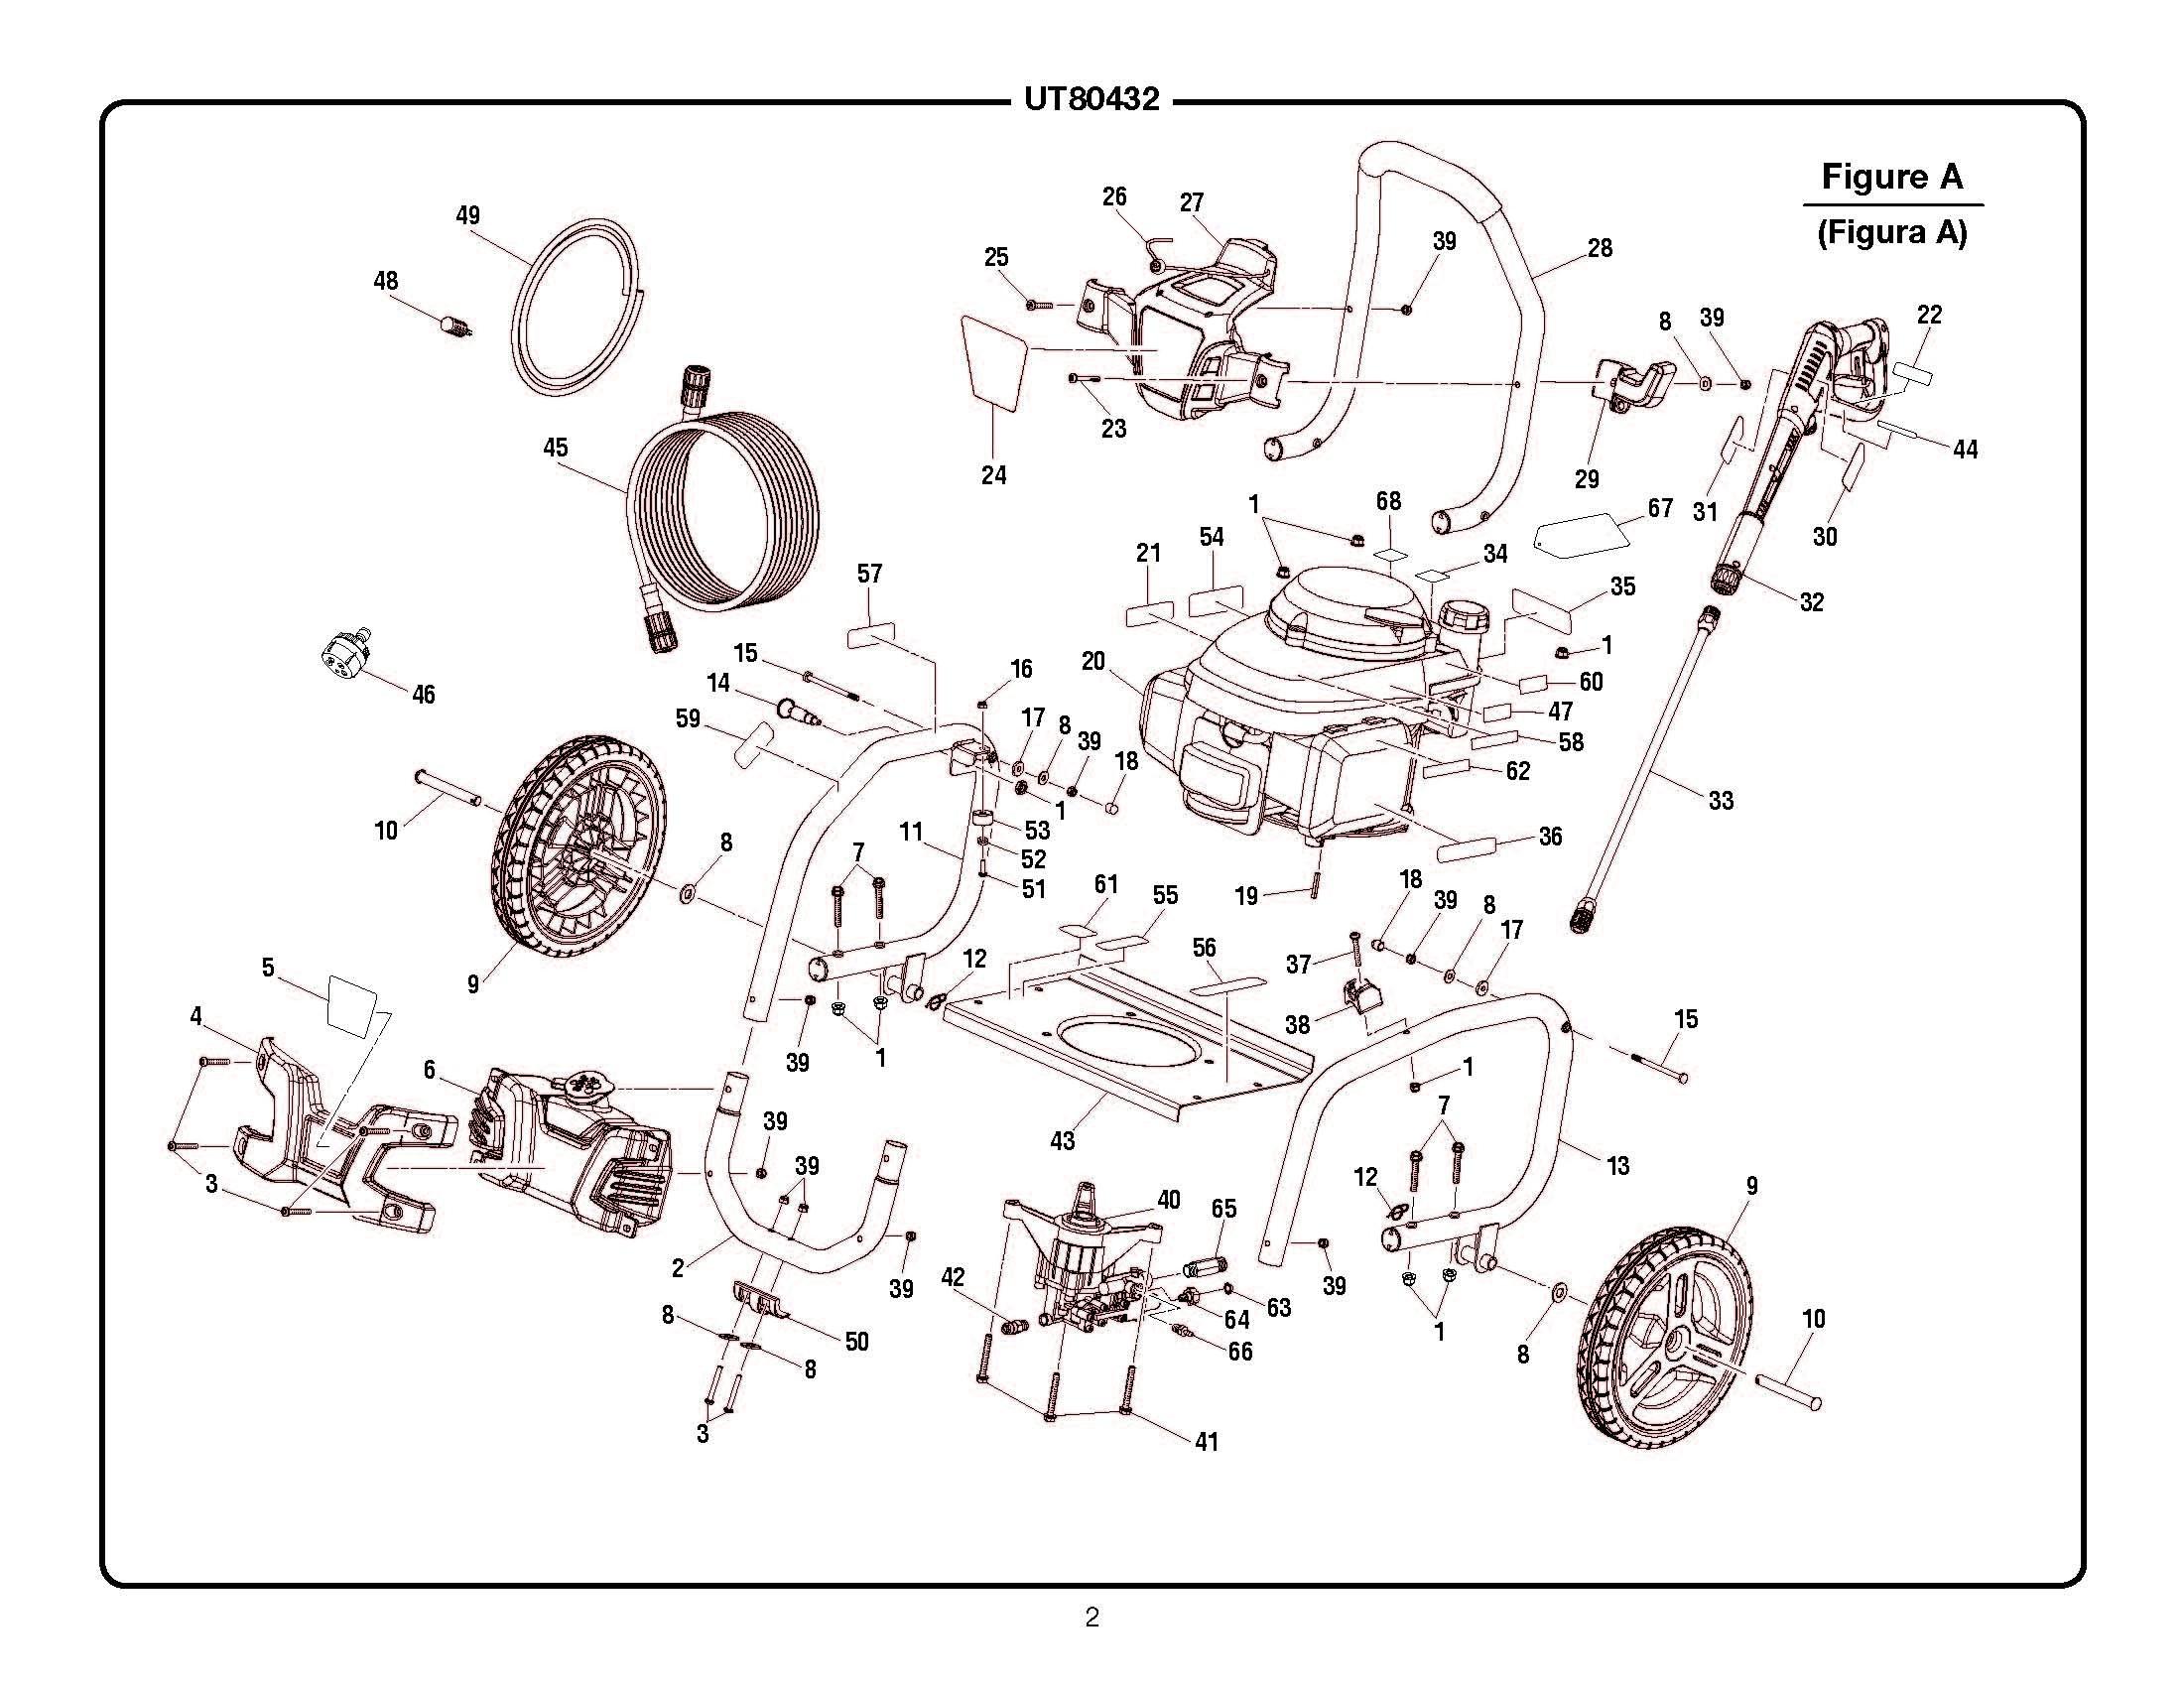 Honda Pressure Washer Parts Diagram Ut Homelite Pressure Washer Parts Homelite Parts Of Honda Pressure Washer Parts Diagram